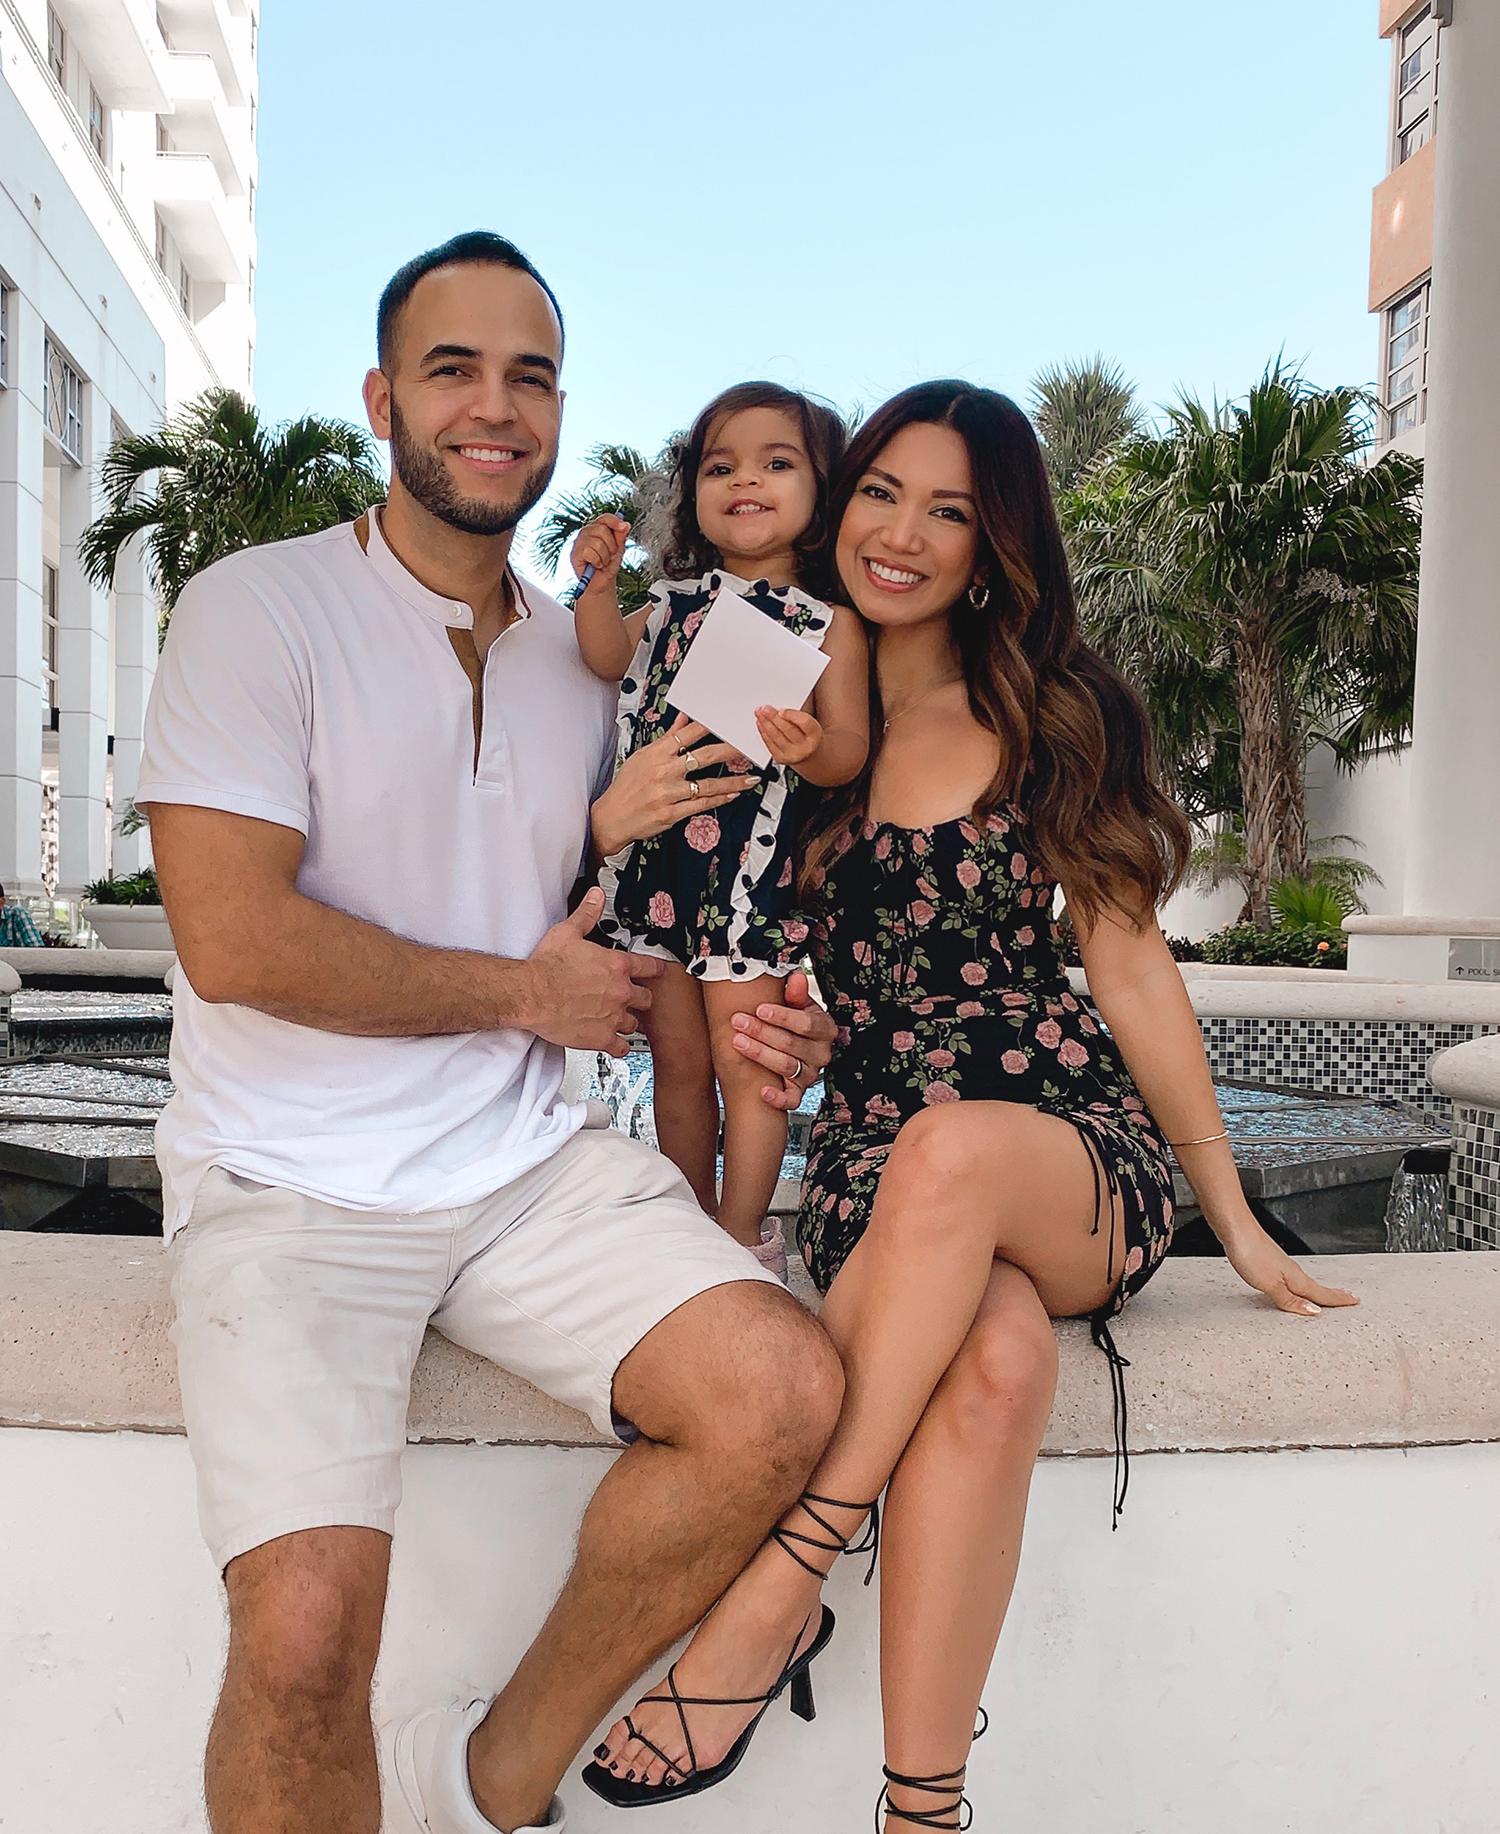 Jessi Malay and family